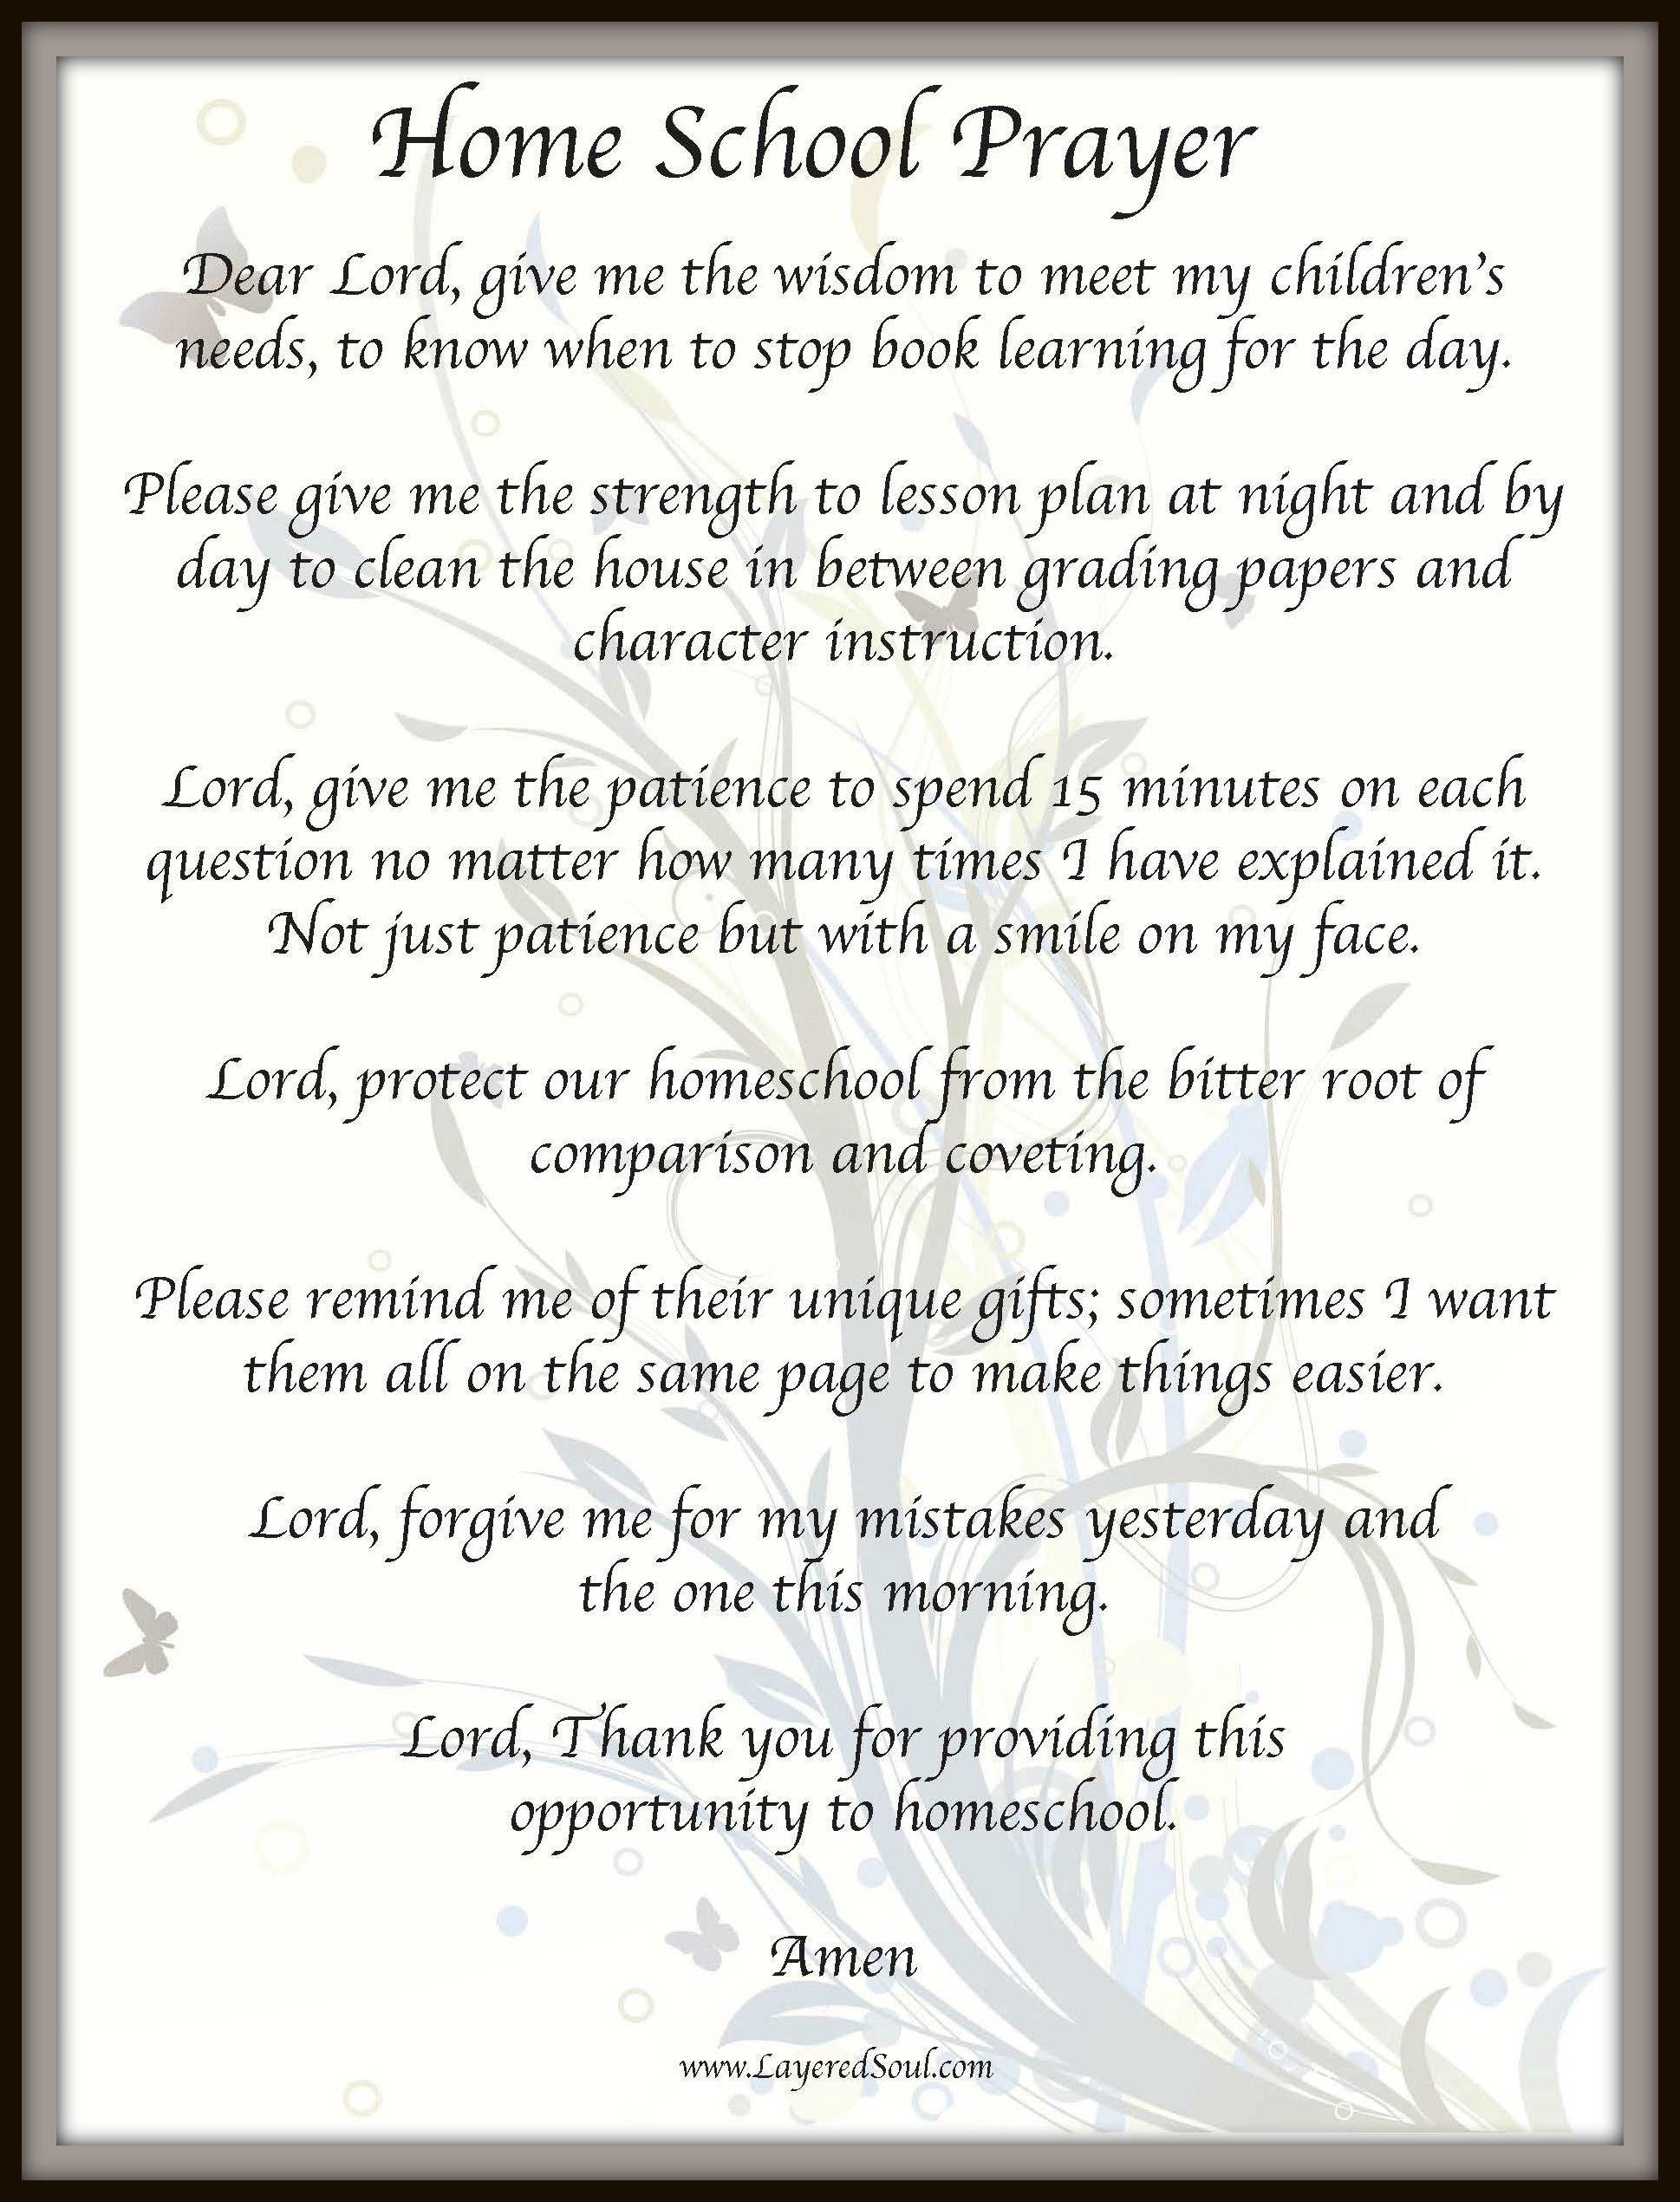 HomeSchool Prayer Homeschooling Made Easy Pinterest